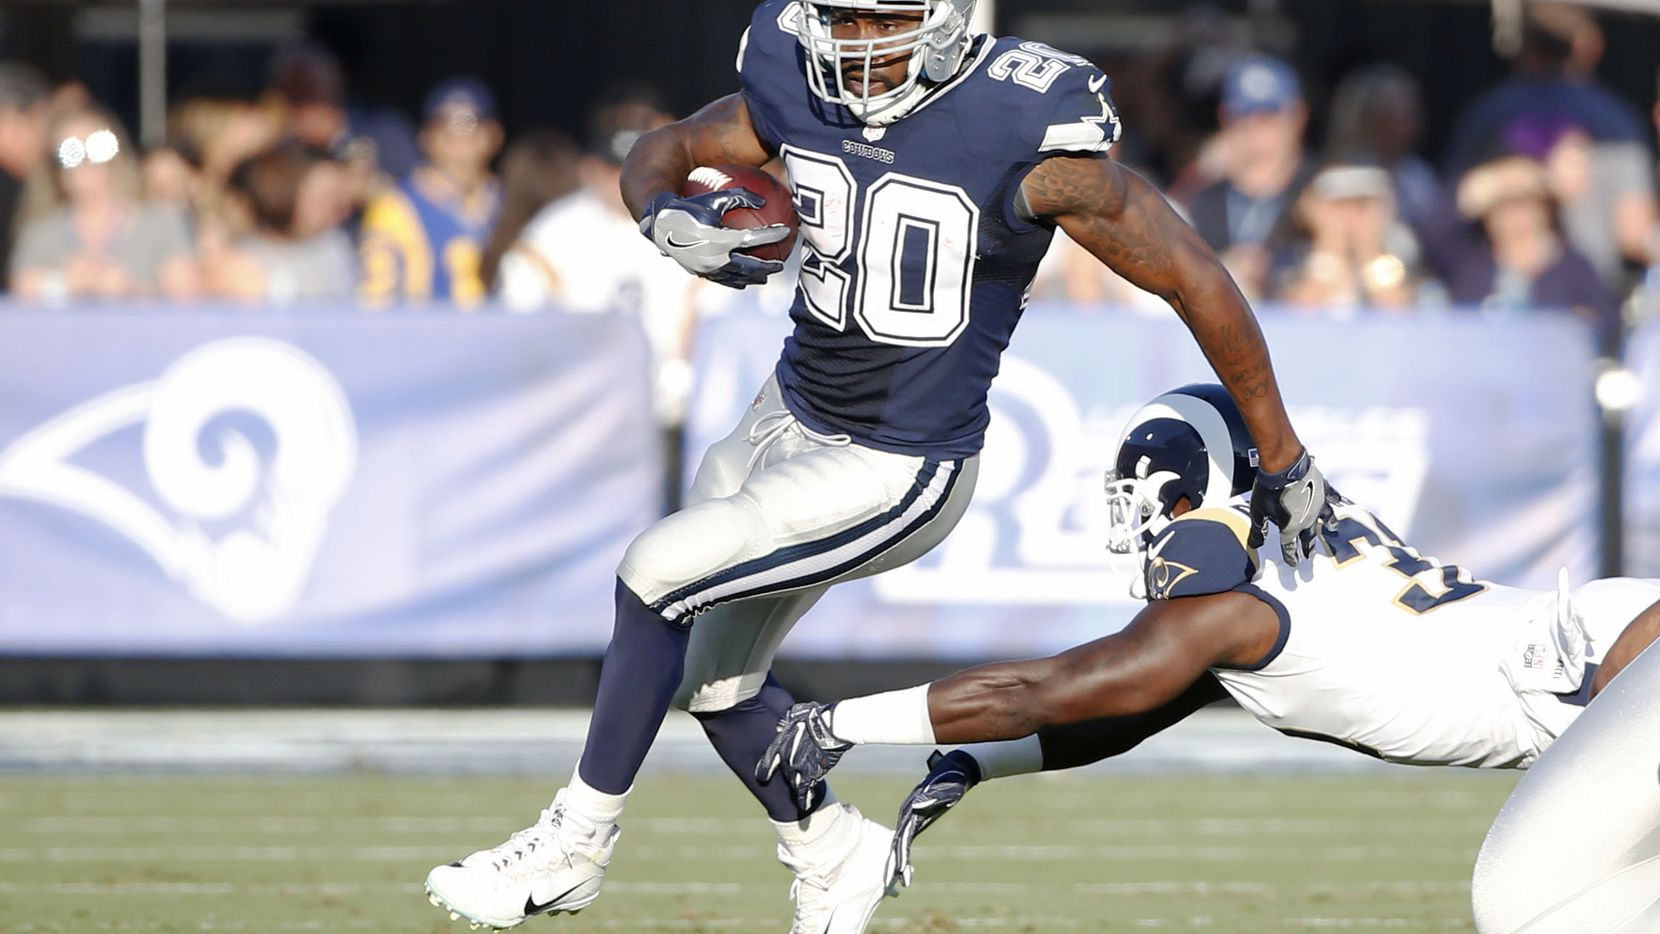 Dallas Cowboys running back Darren McFadden runs past a Los Angeles Rams player during a 2017 preseason game.